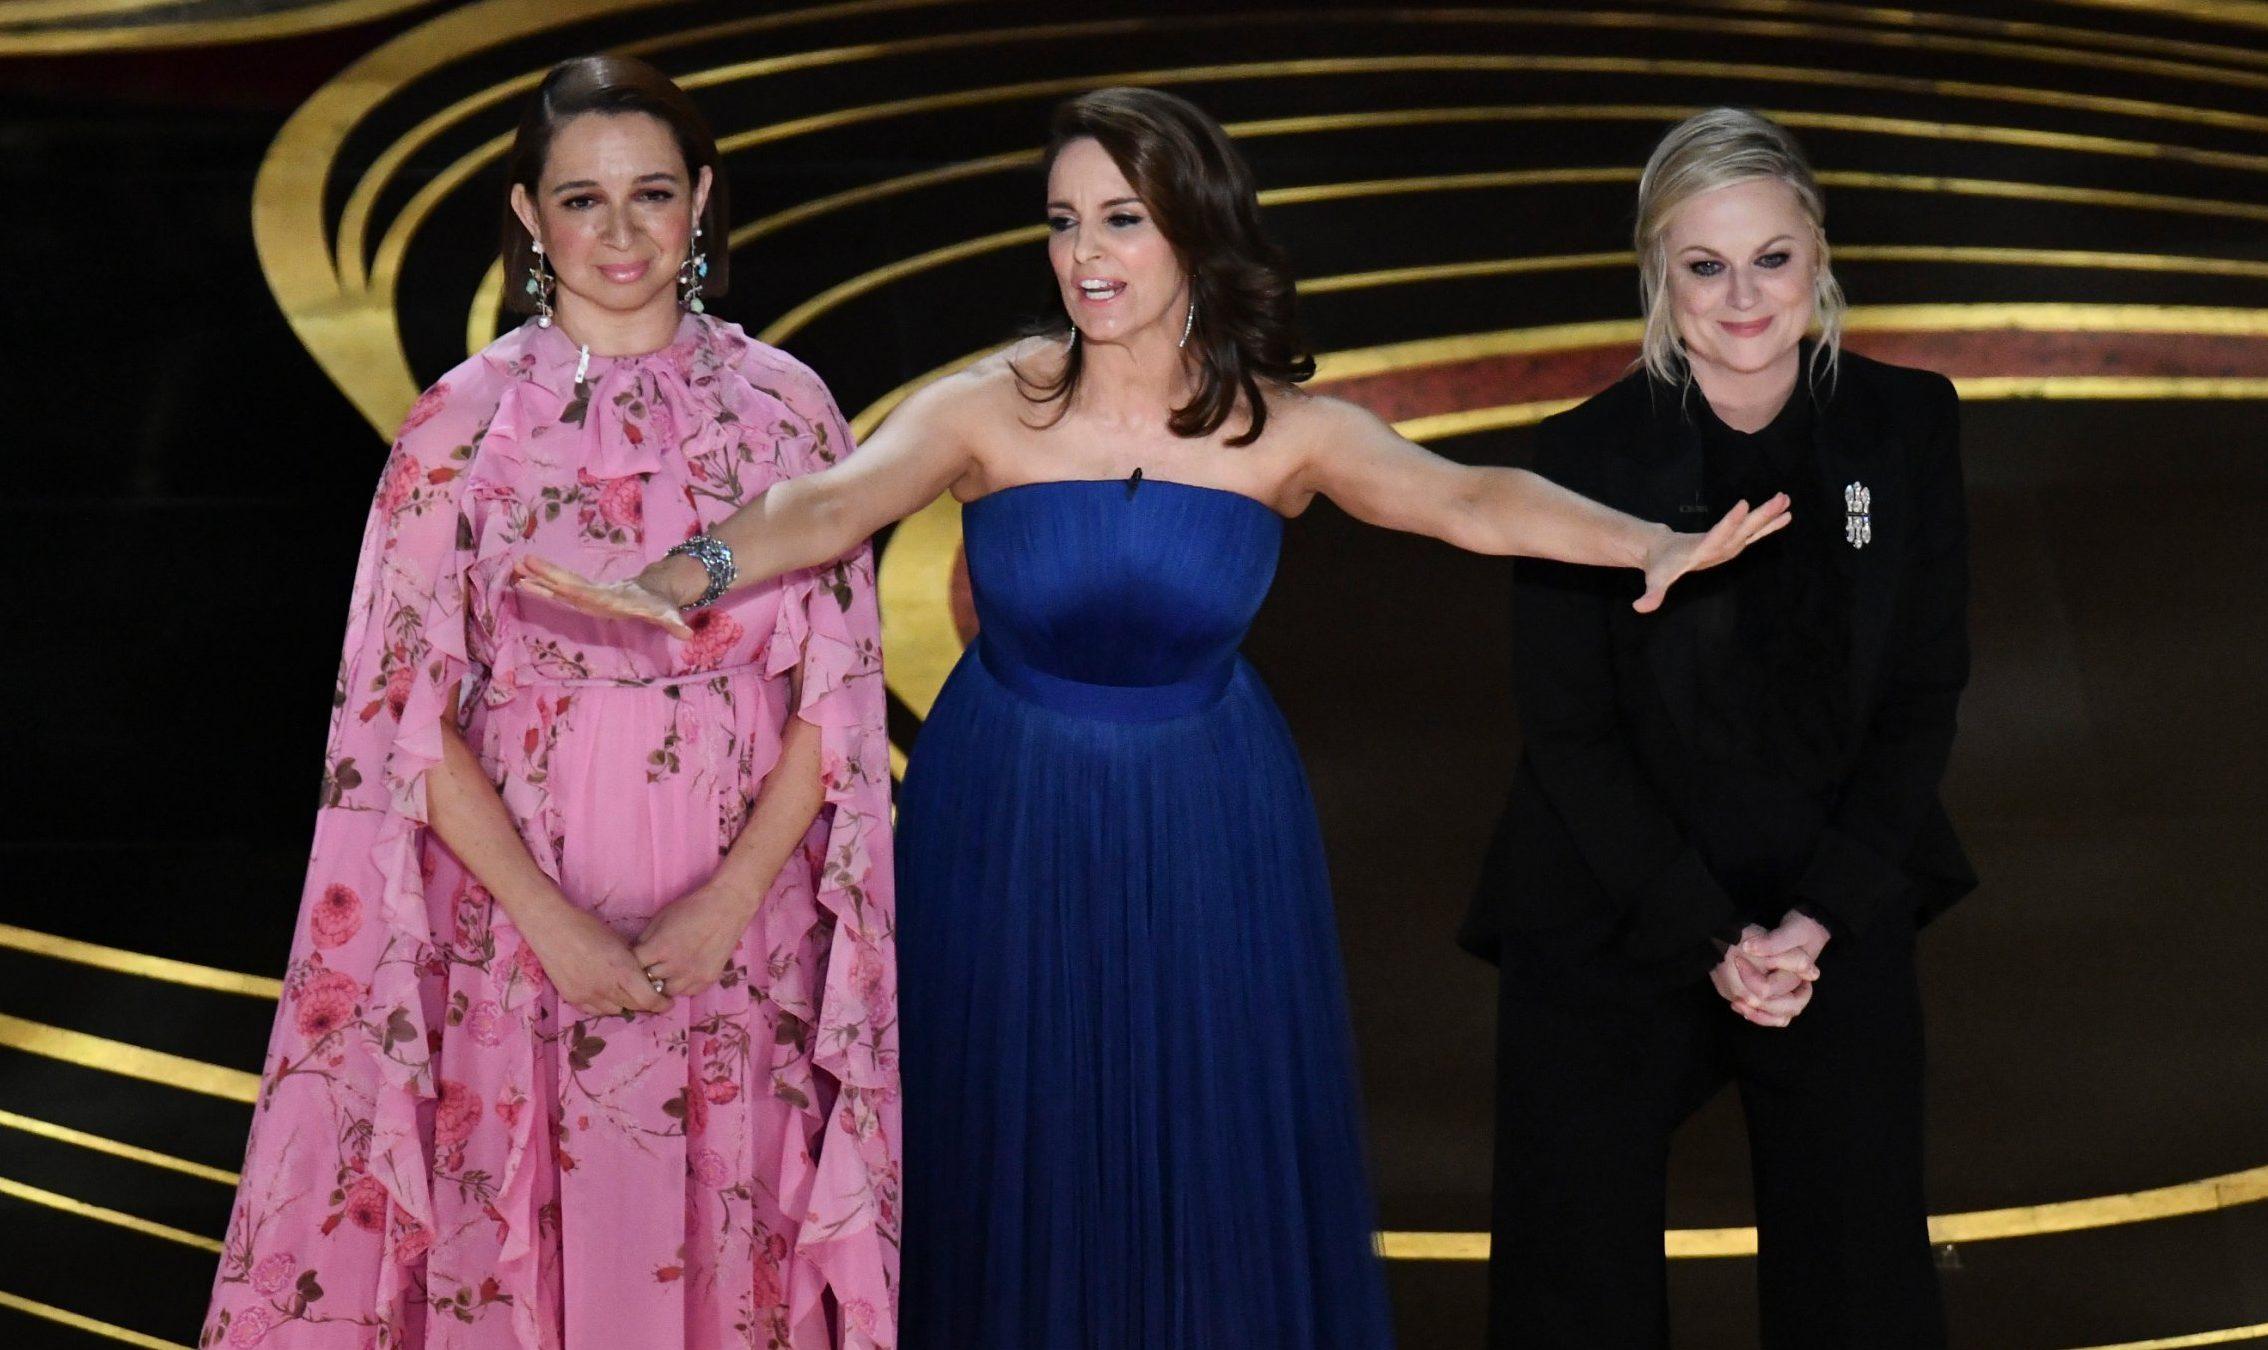 Mandatory Credit: Photo by Rob Latour/REX (10112915aj) Maya Rudolph, Tina Fey and Amy Poehler 91st Annual Academy Awards, Show, Los Angeles, USA - 24 Feb 2019